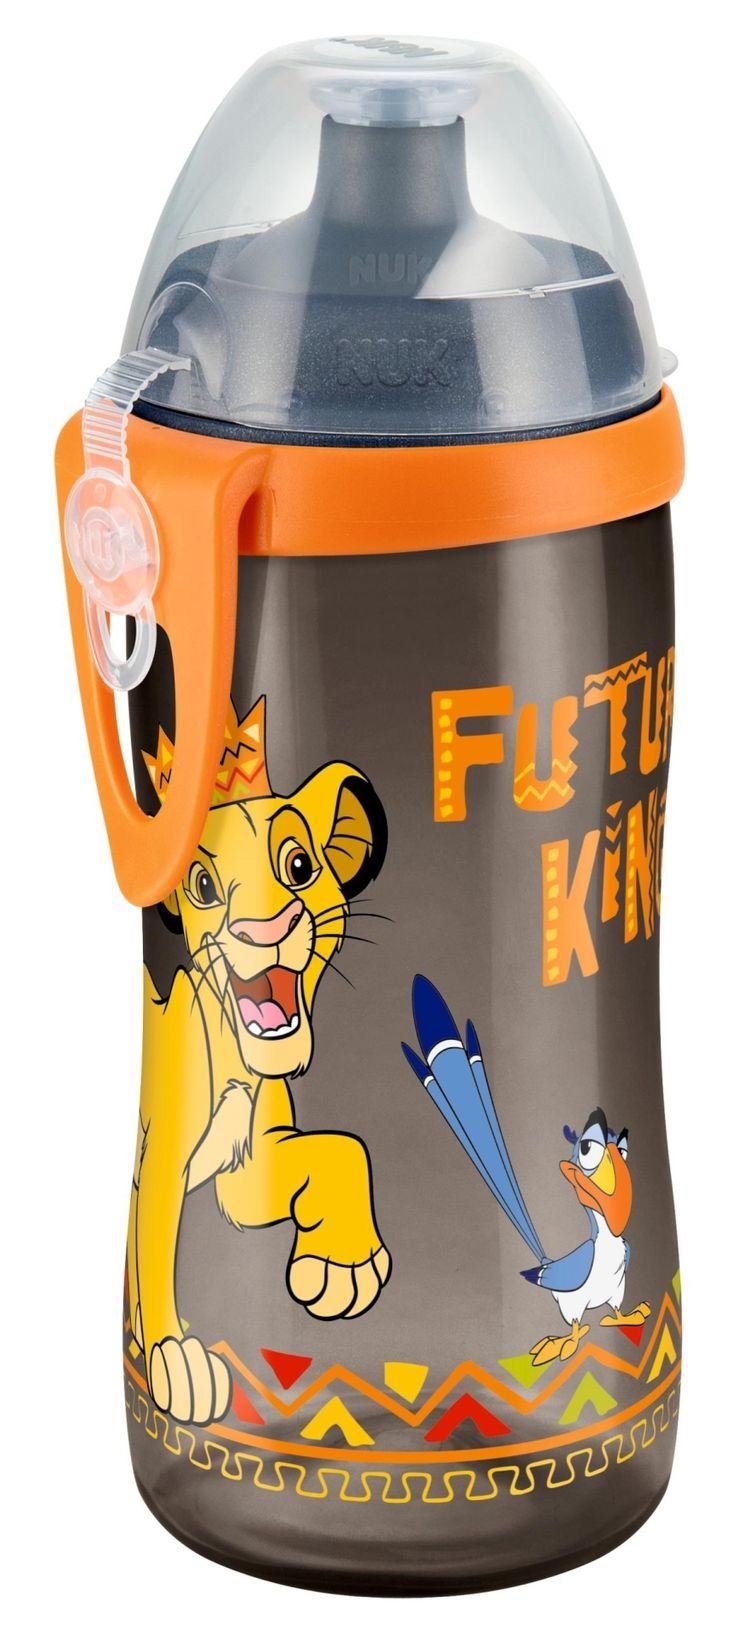 NUK Disney Lion King Junior Cup 2017 - Buy at kidsroom | Nursing & Feeding